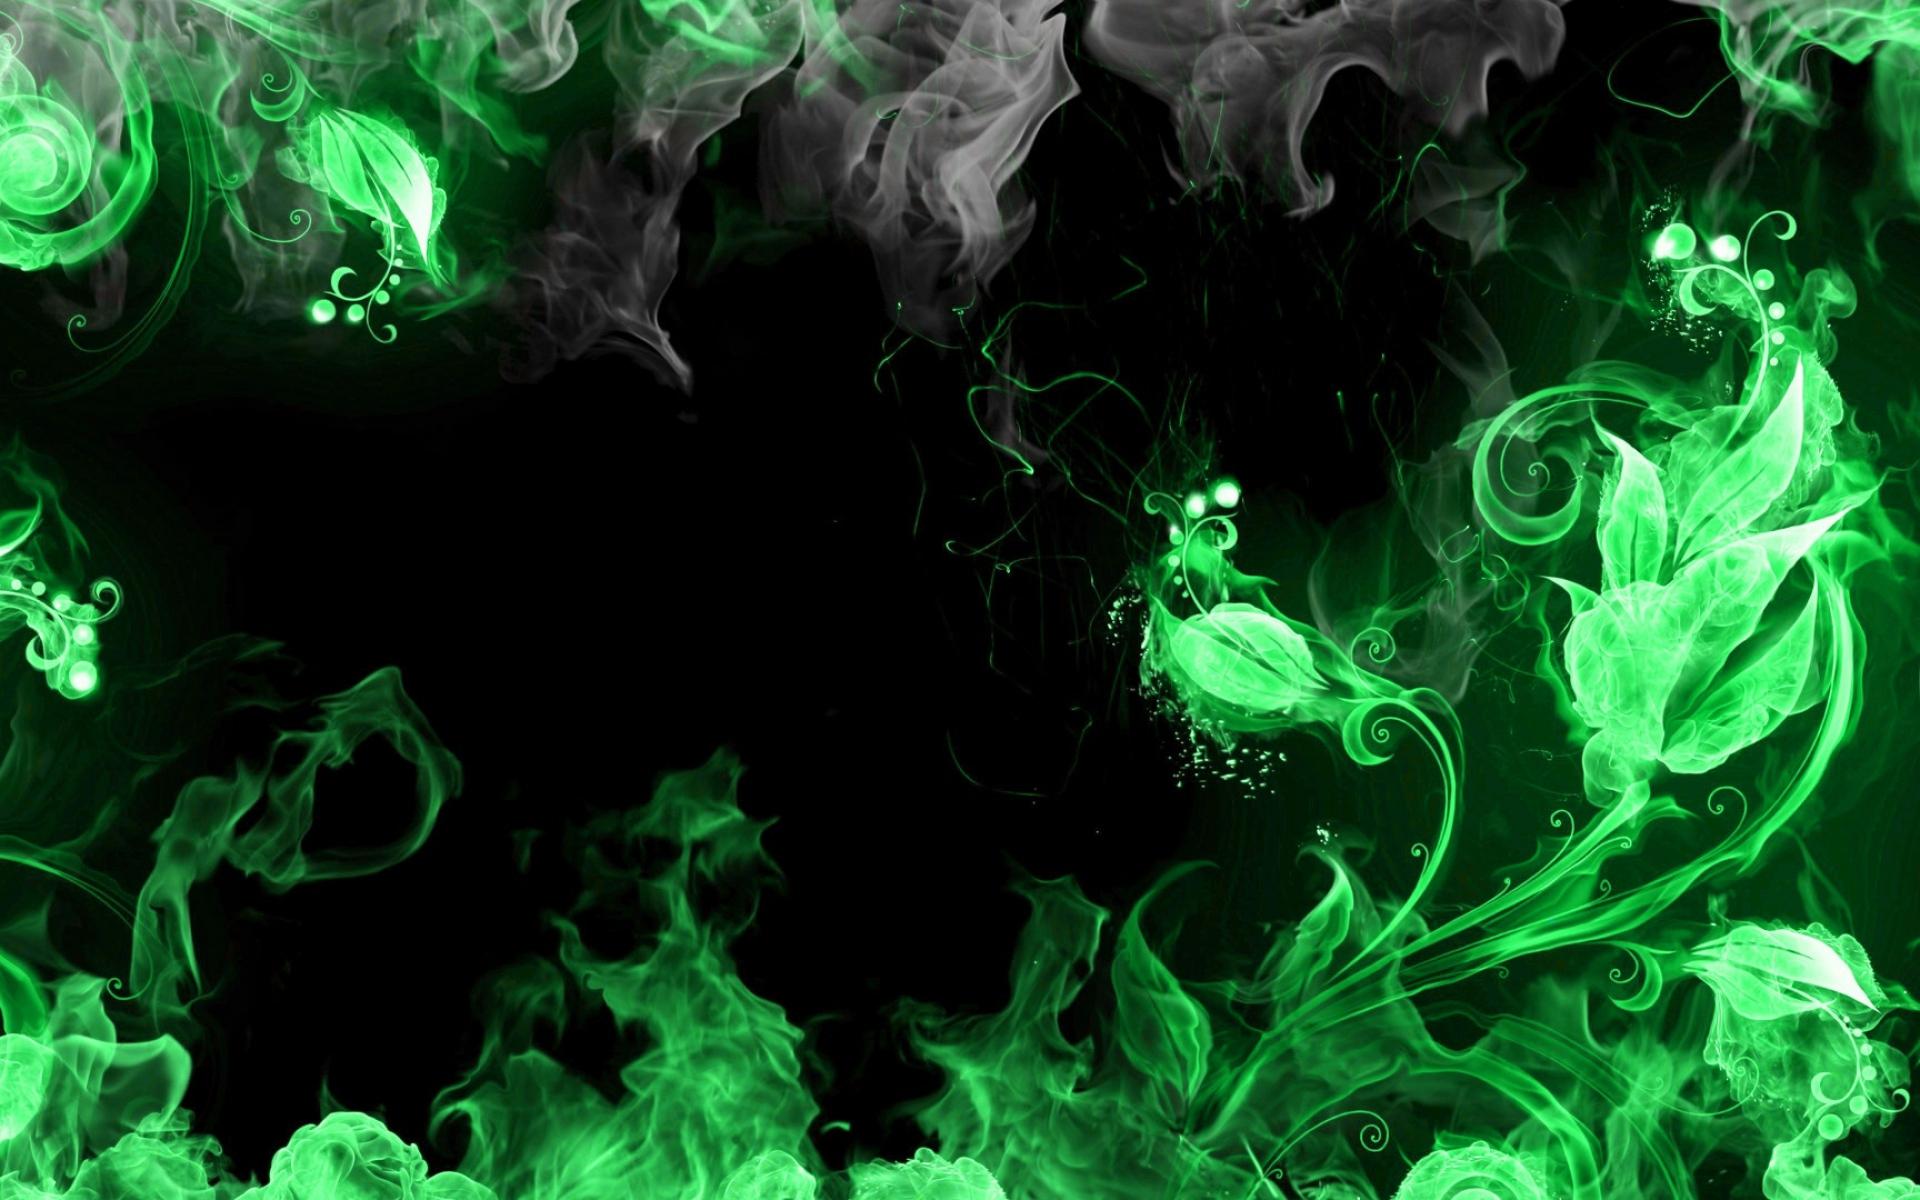 Fire Hd Wallpaper Green And Black Smoke Background